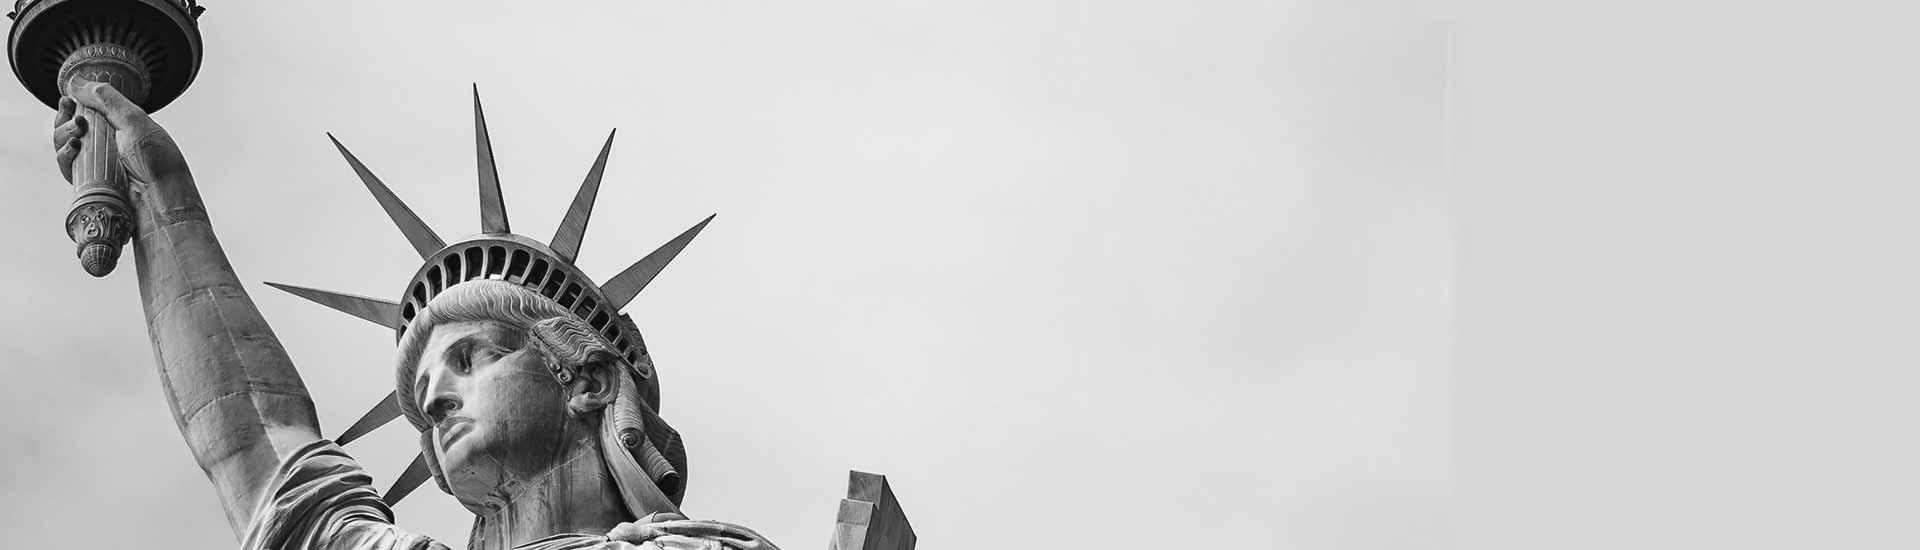 slider-statue-of-liberty